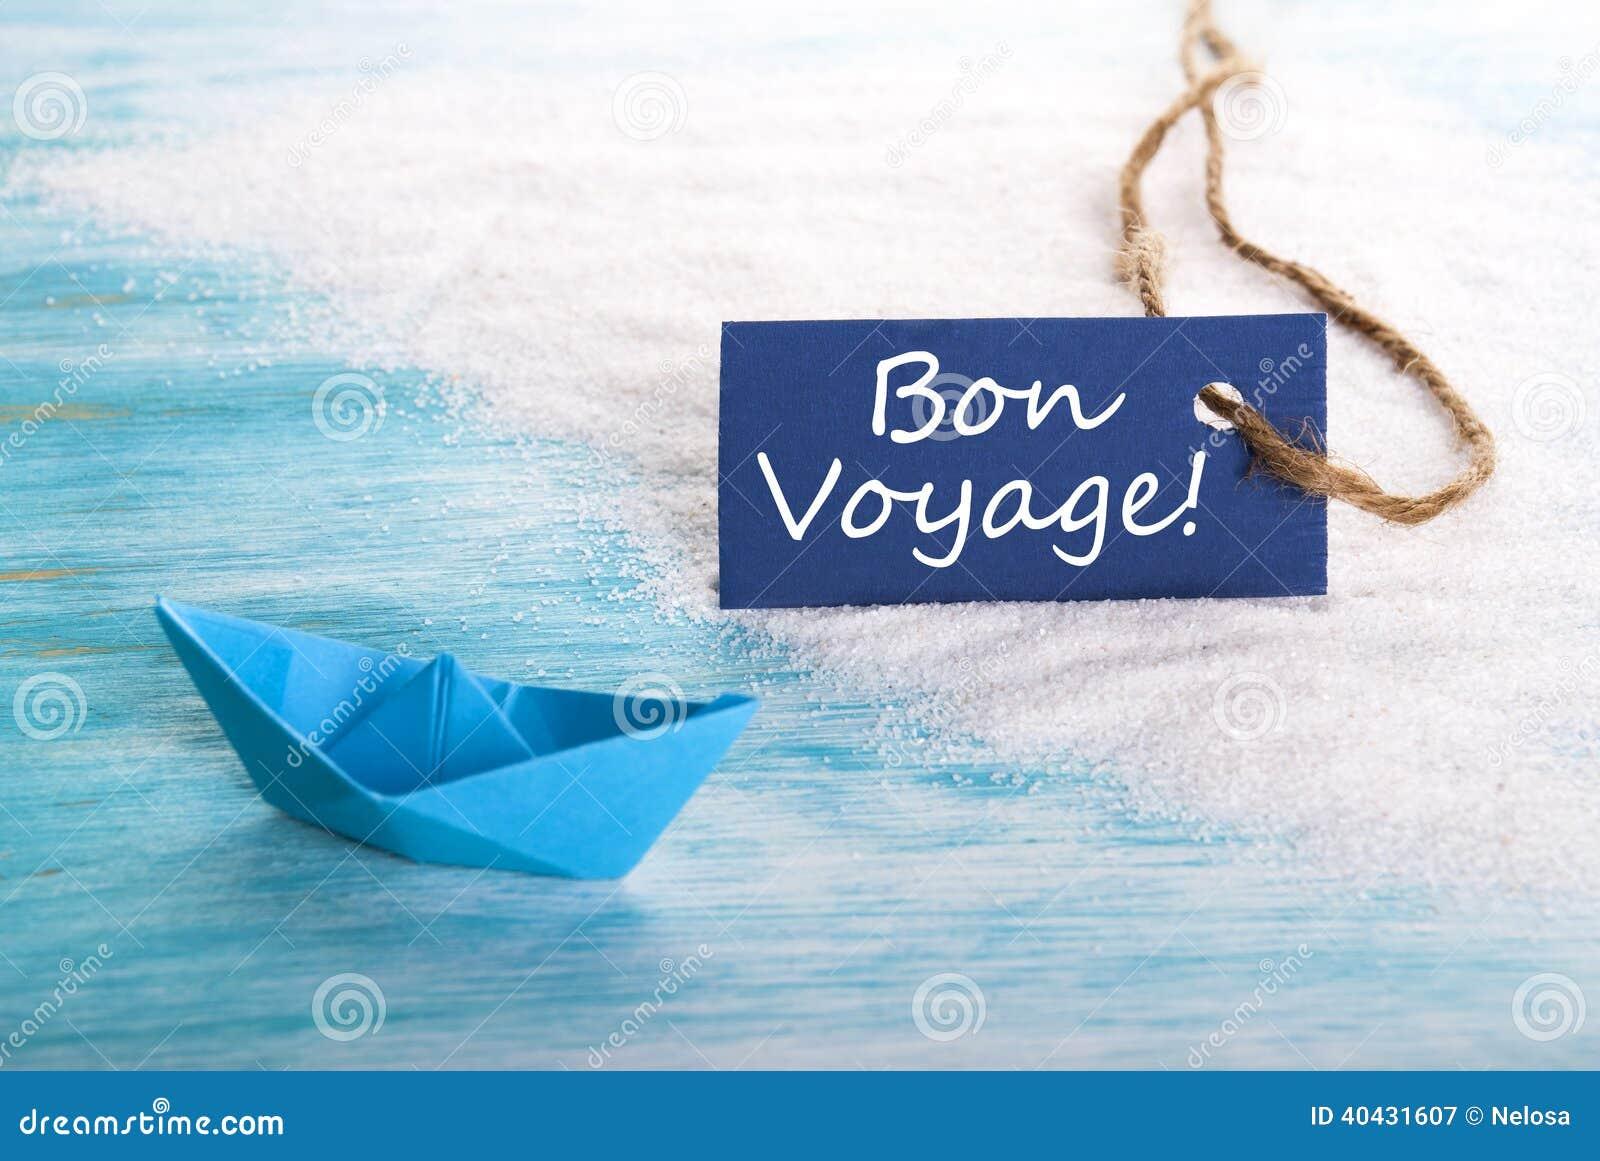 Blue Label With Bon Voyage Stock Photo Image 40431607